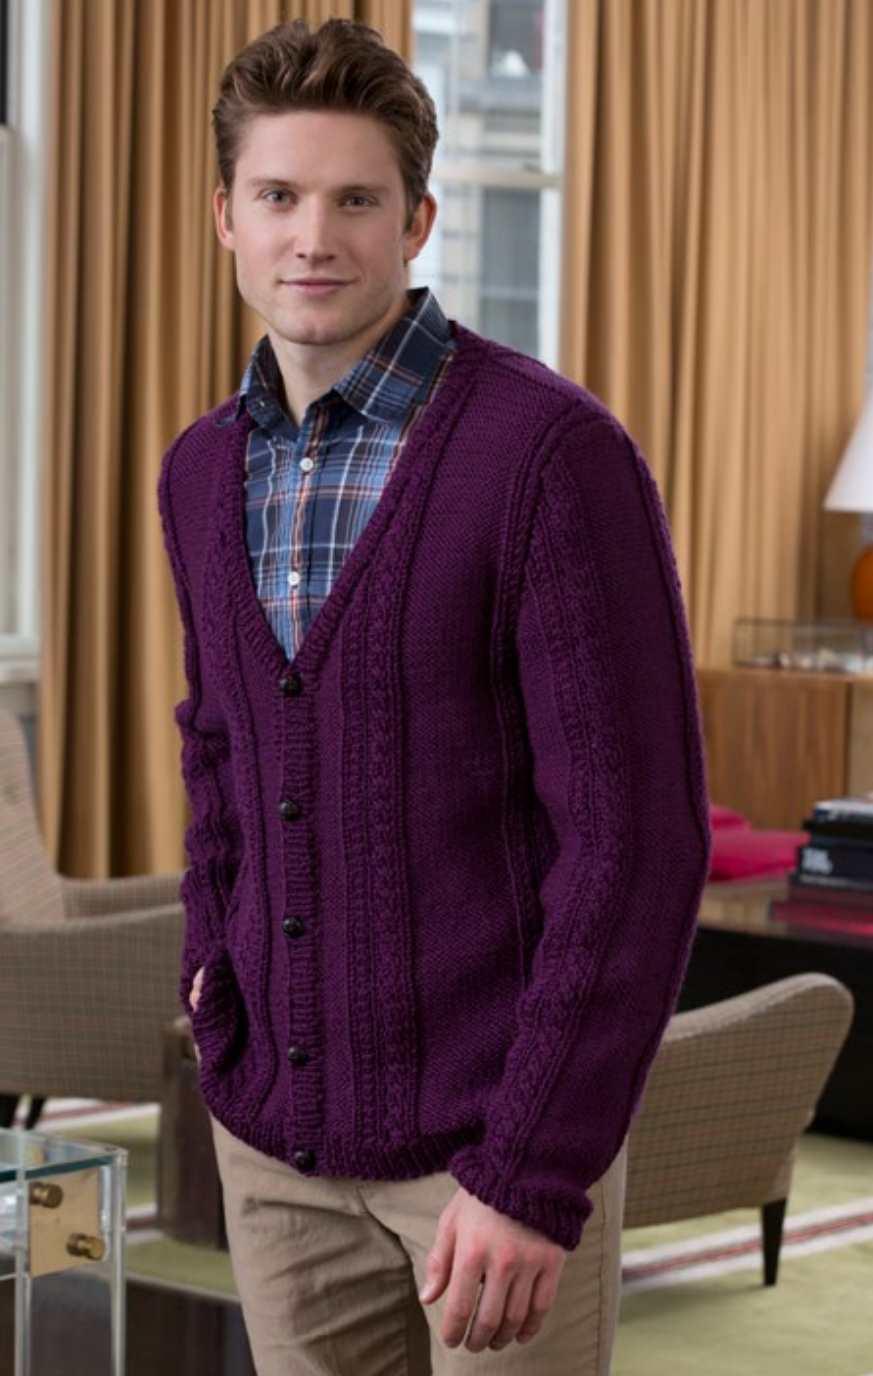 Men's V-Neck Cable Cardigan Free Knitting Pattern